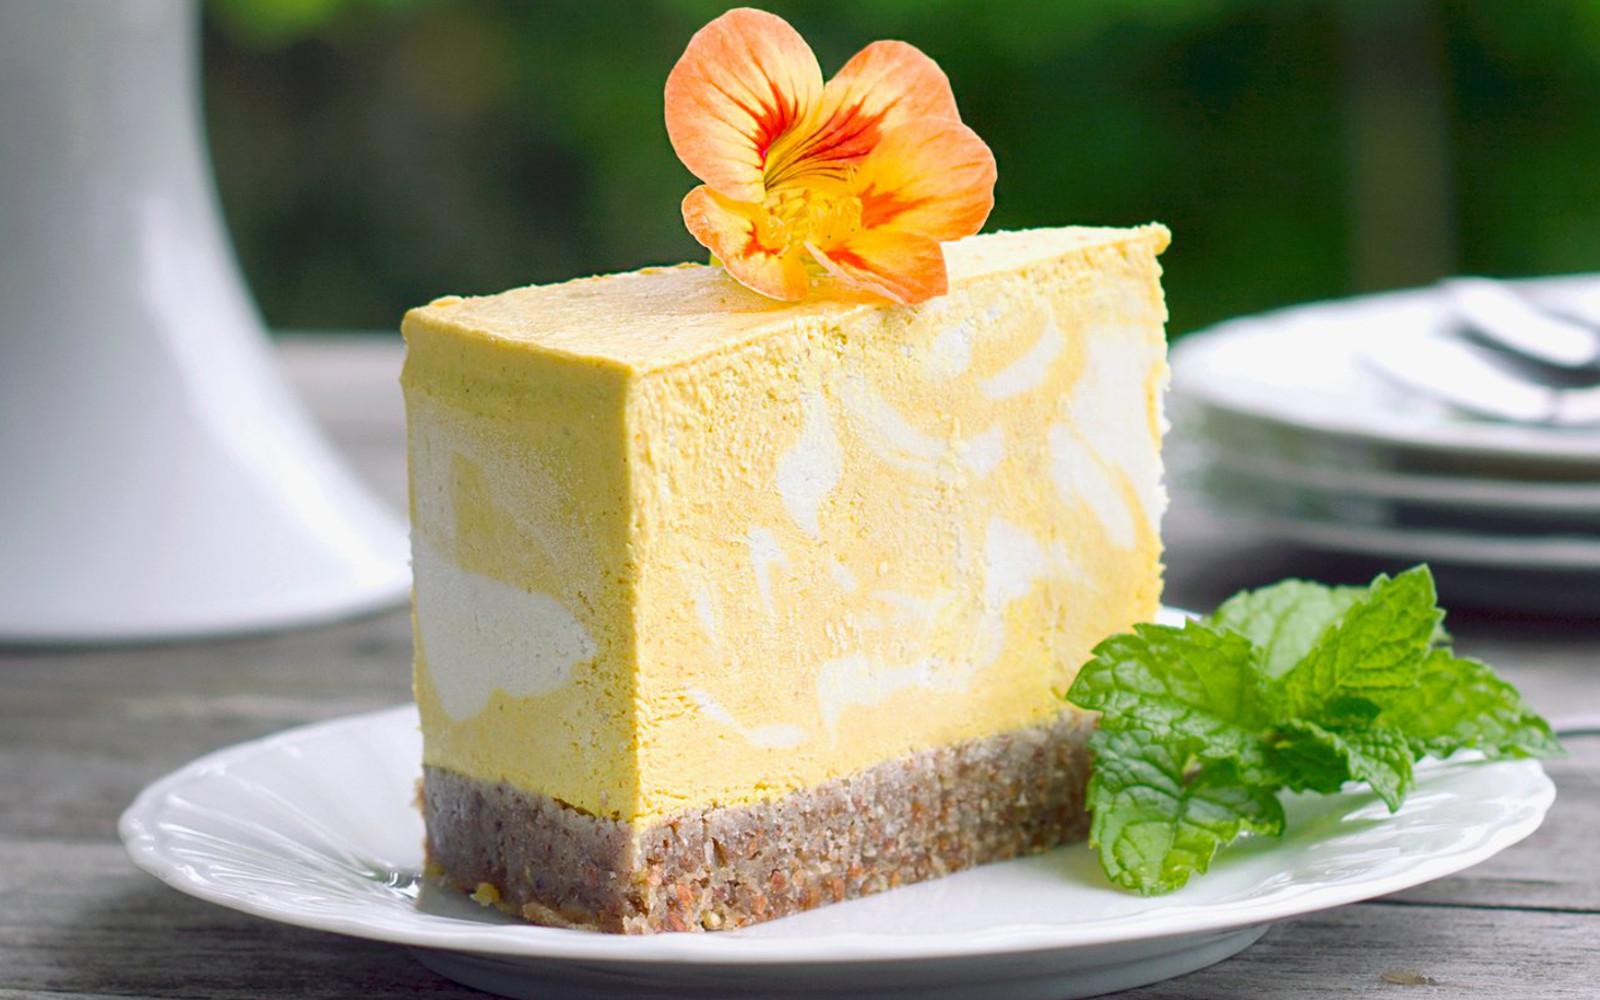 Mango and Turmeric Cheesecake